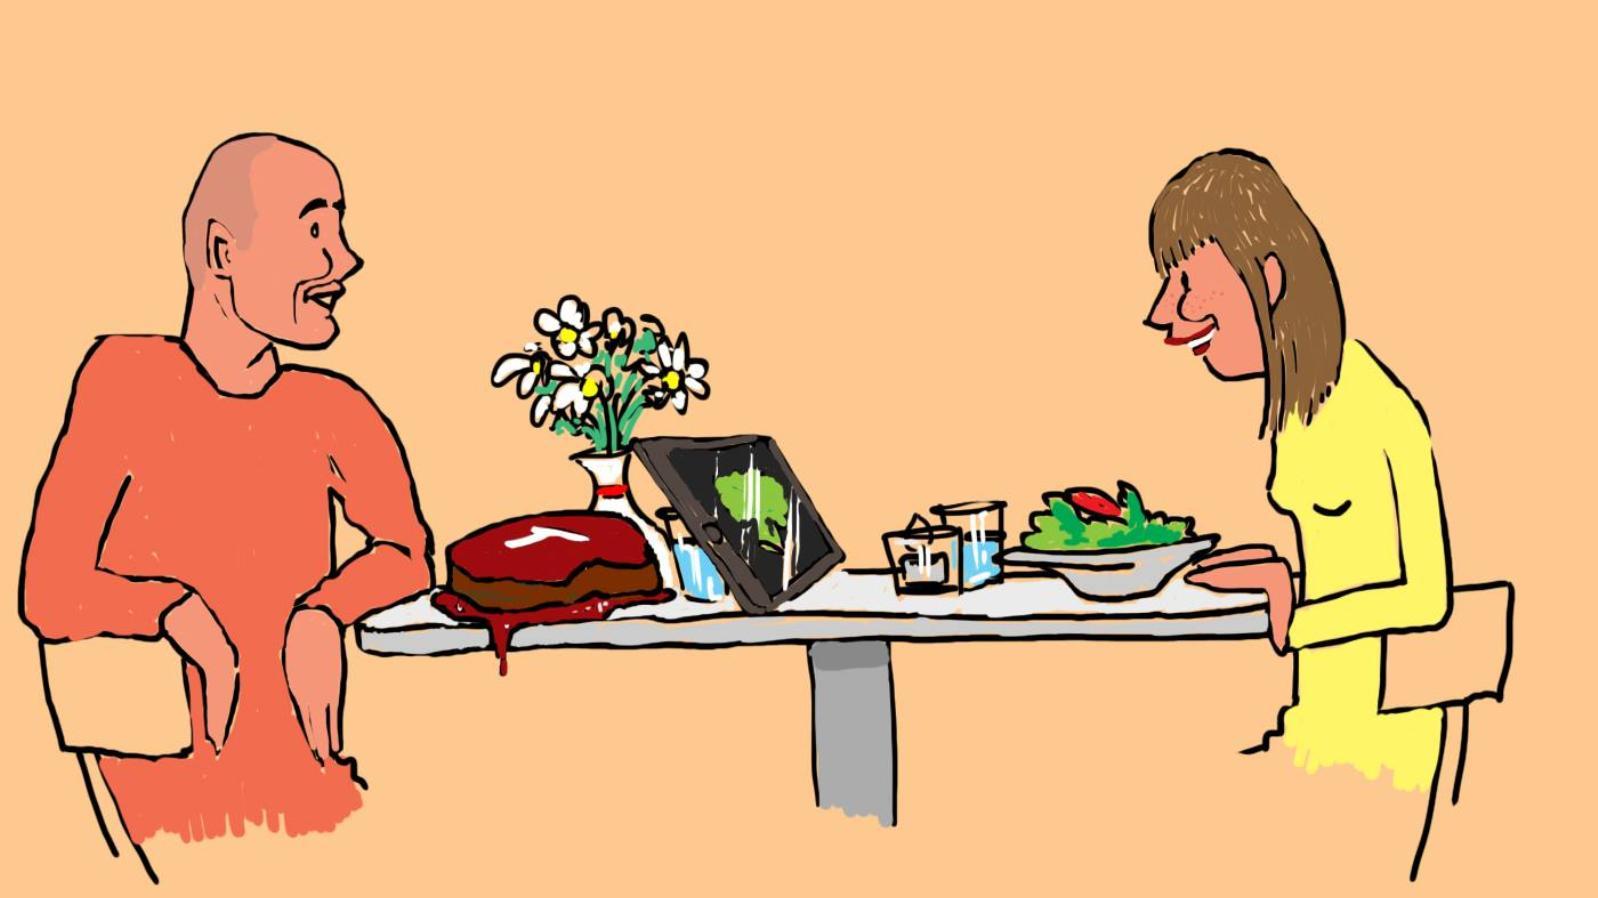 Meat eater dating vegetarian